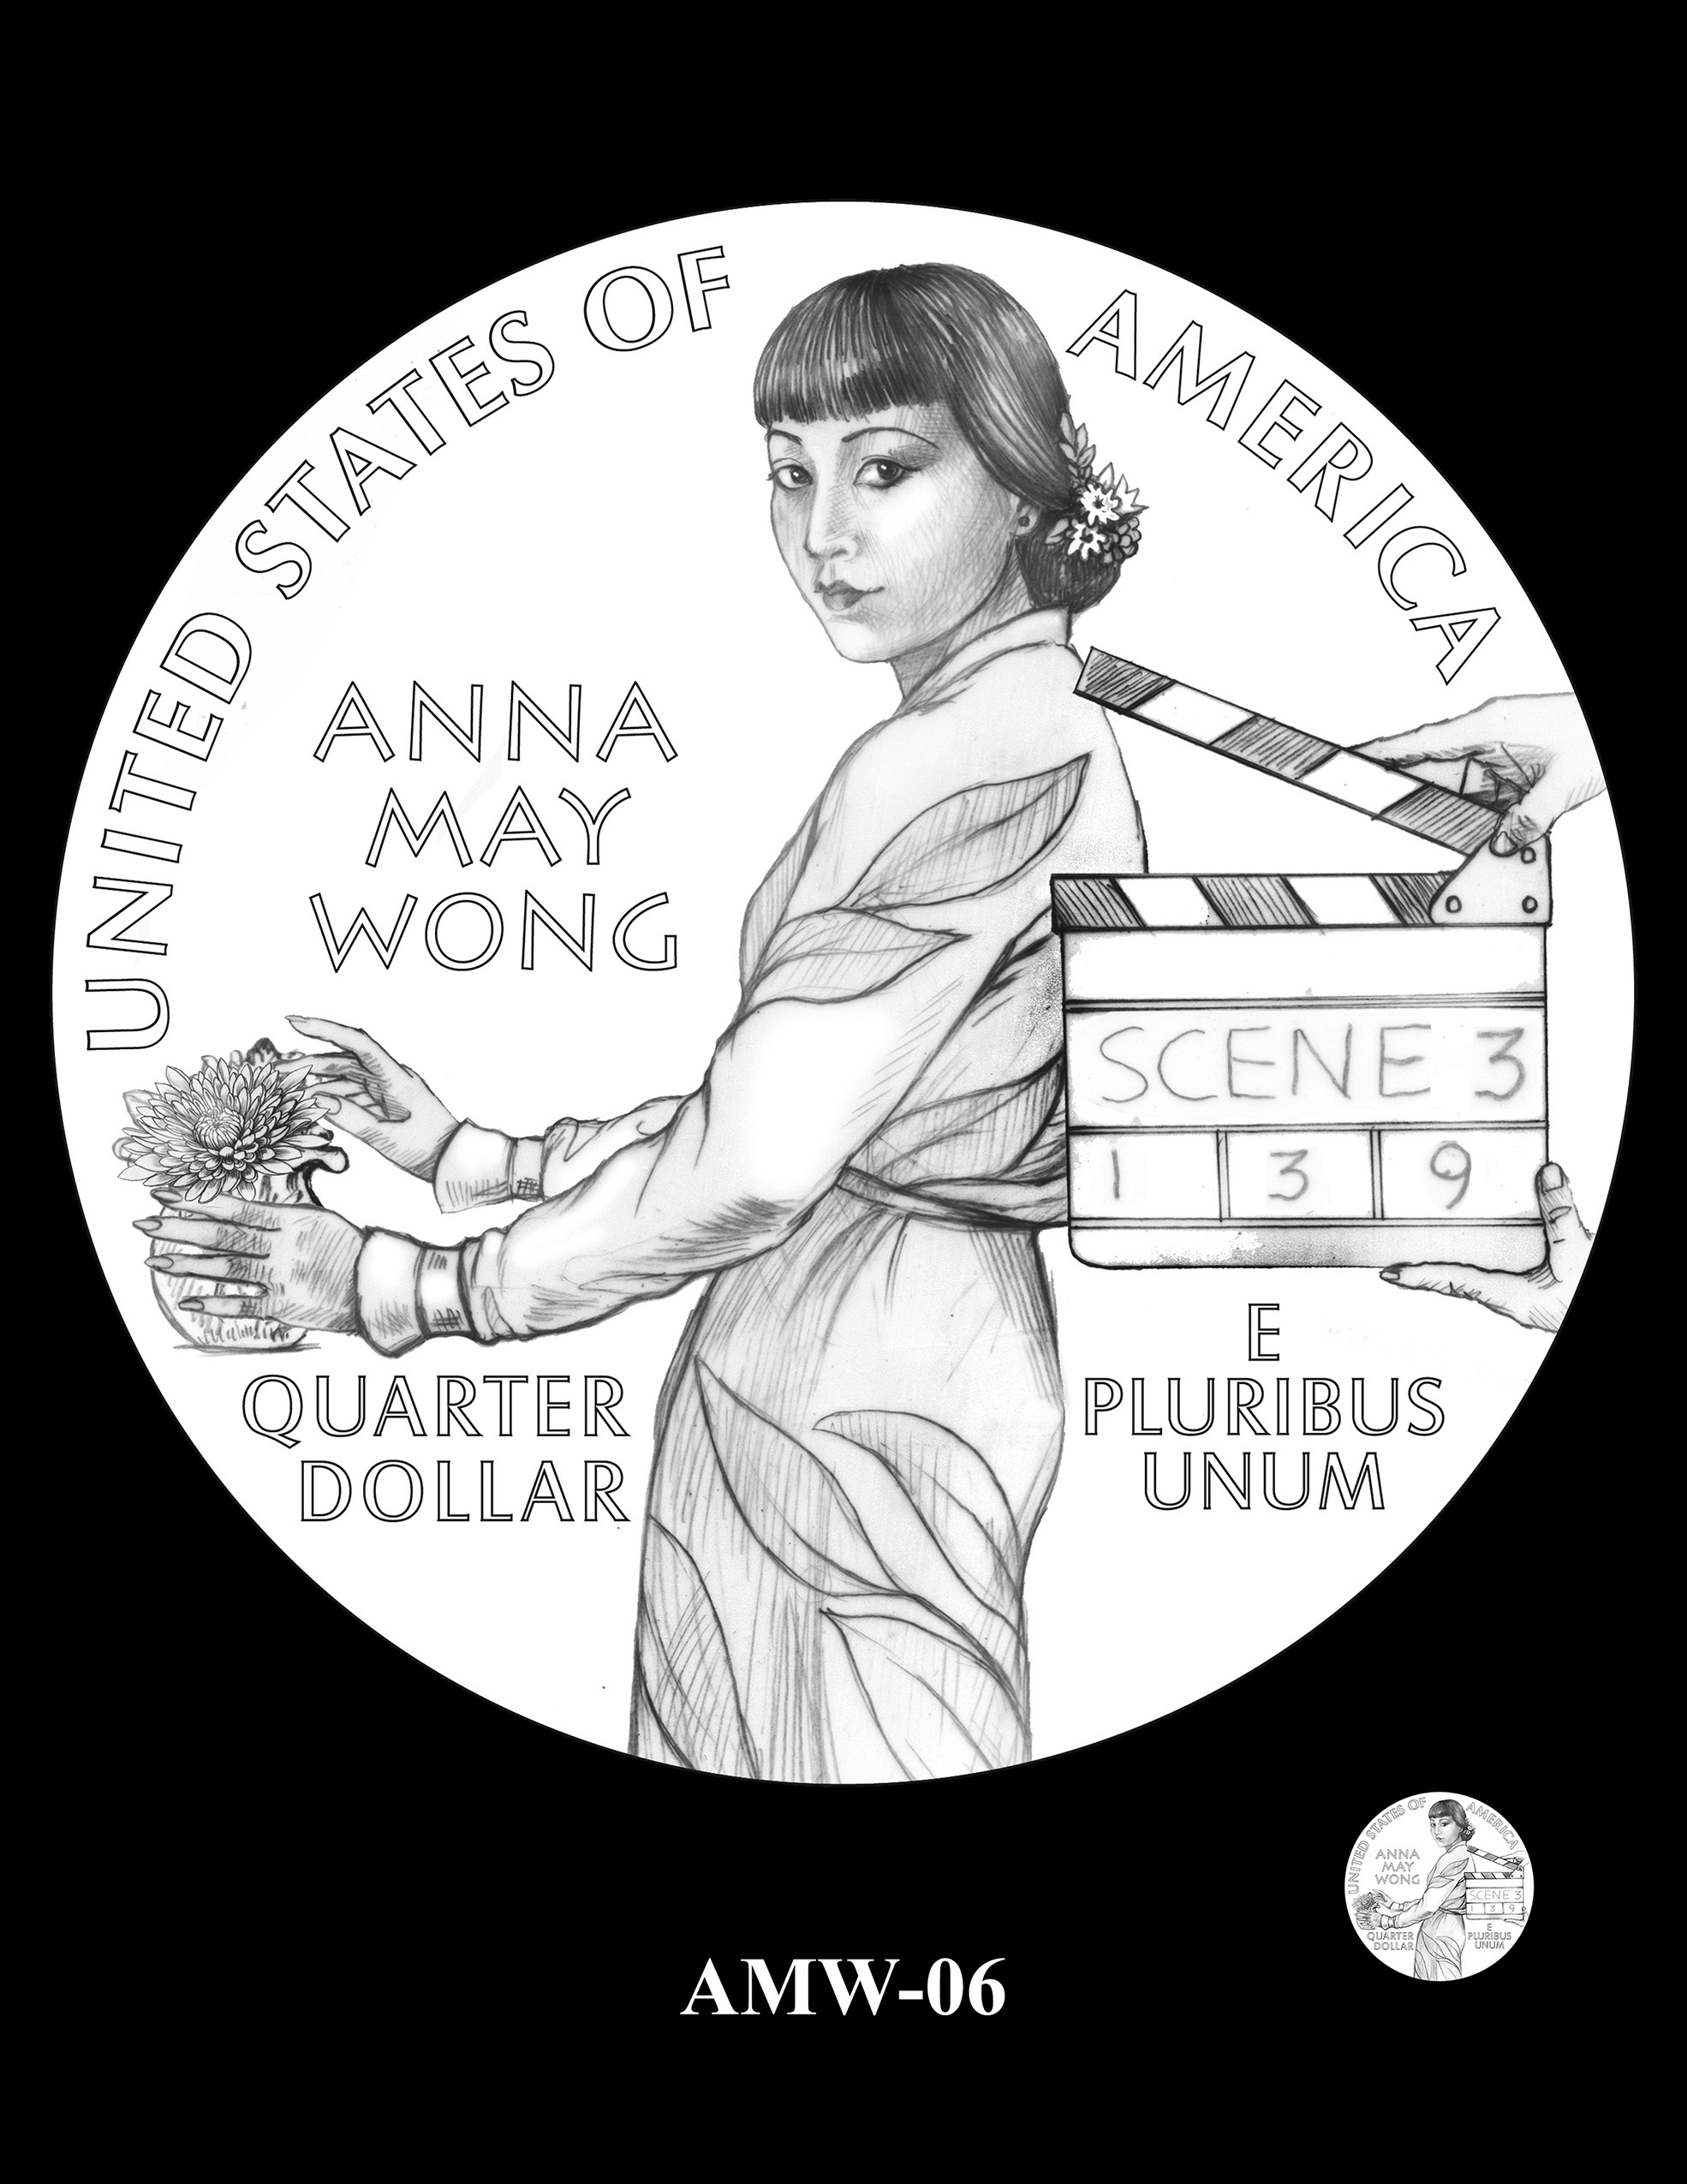 AMW-06 -- 2022 American Women Quarters - Anna May Wong